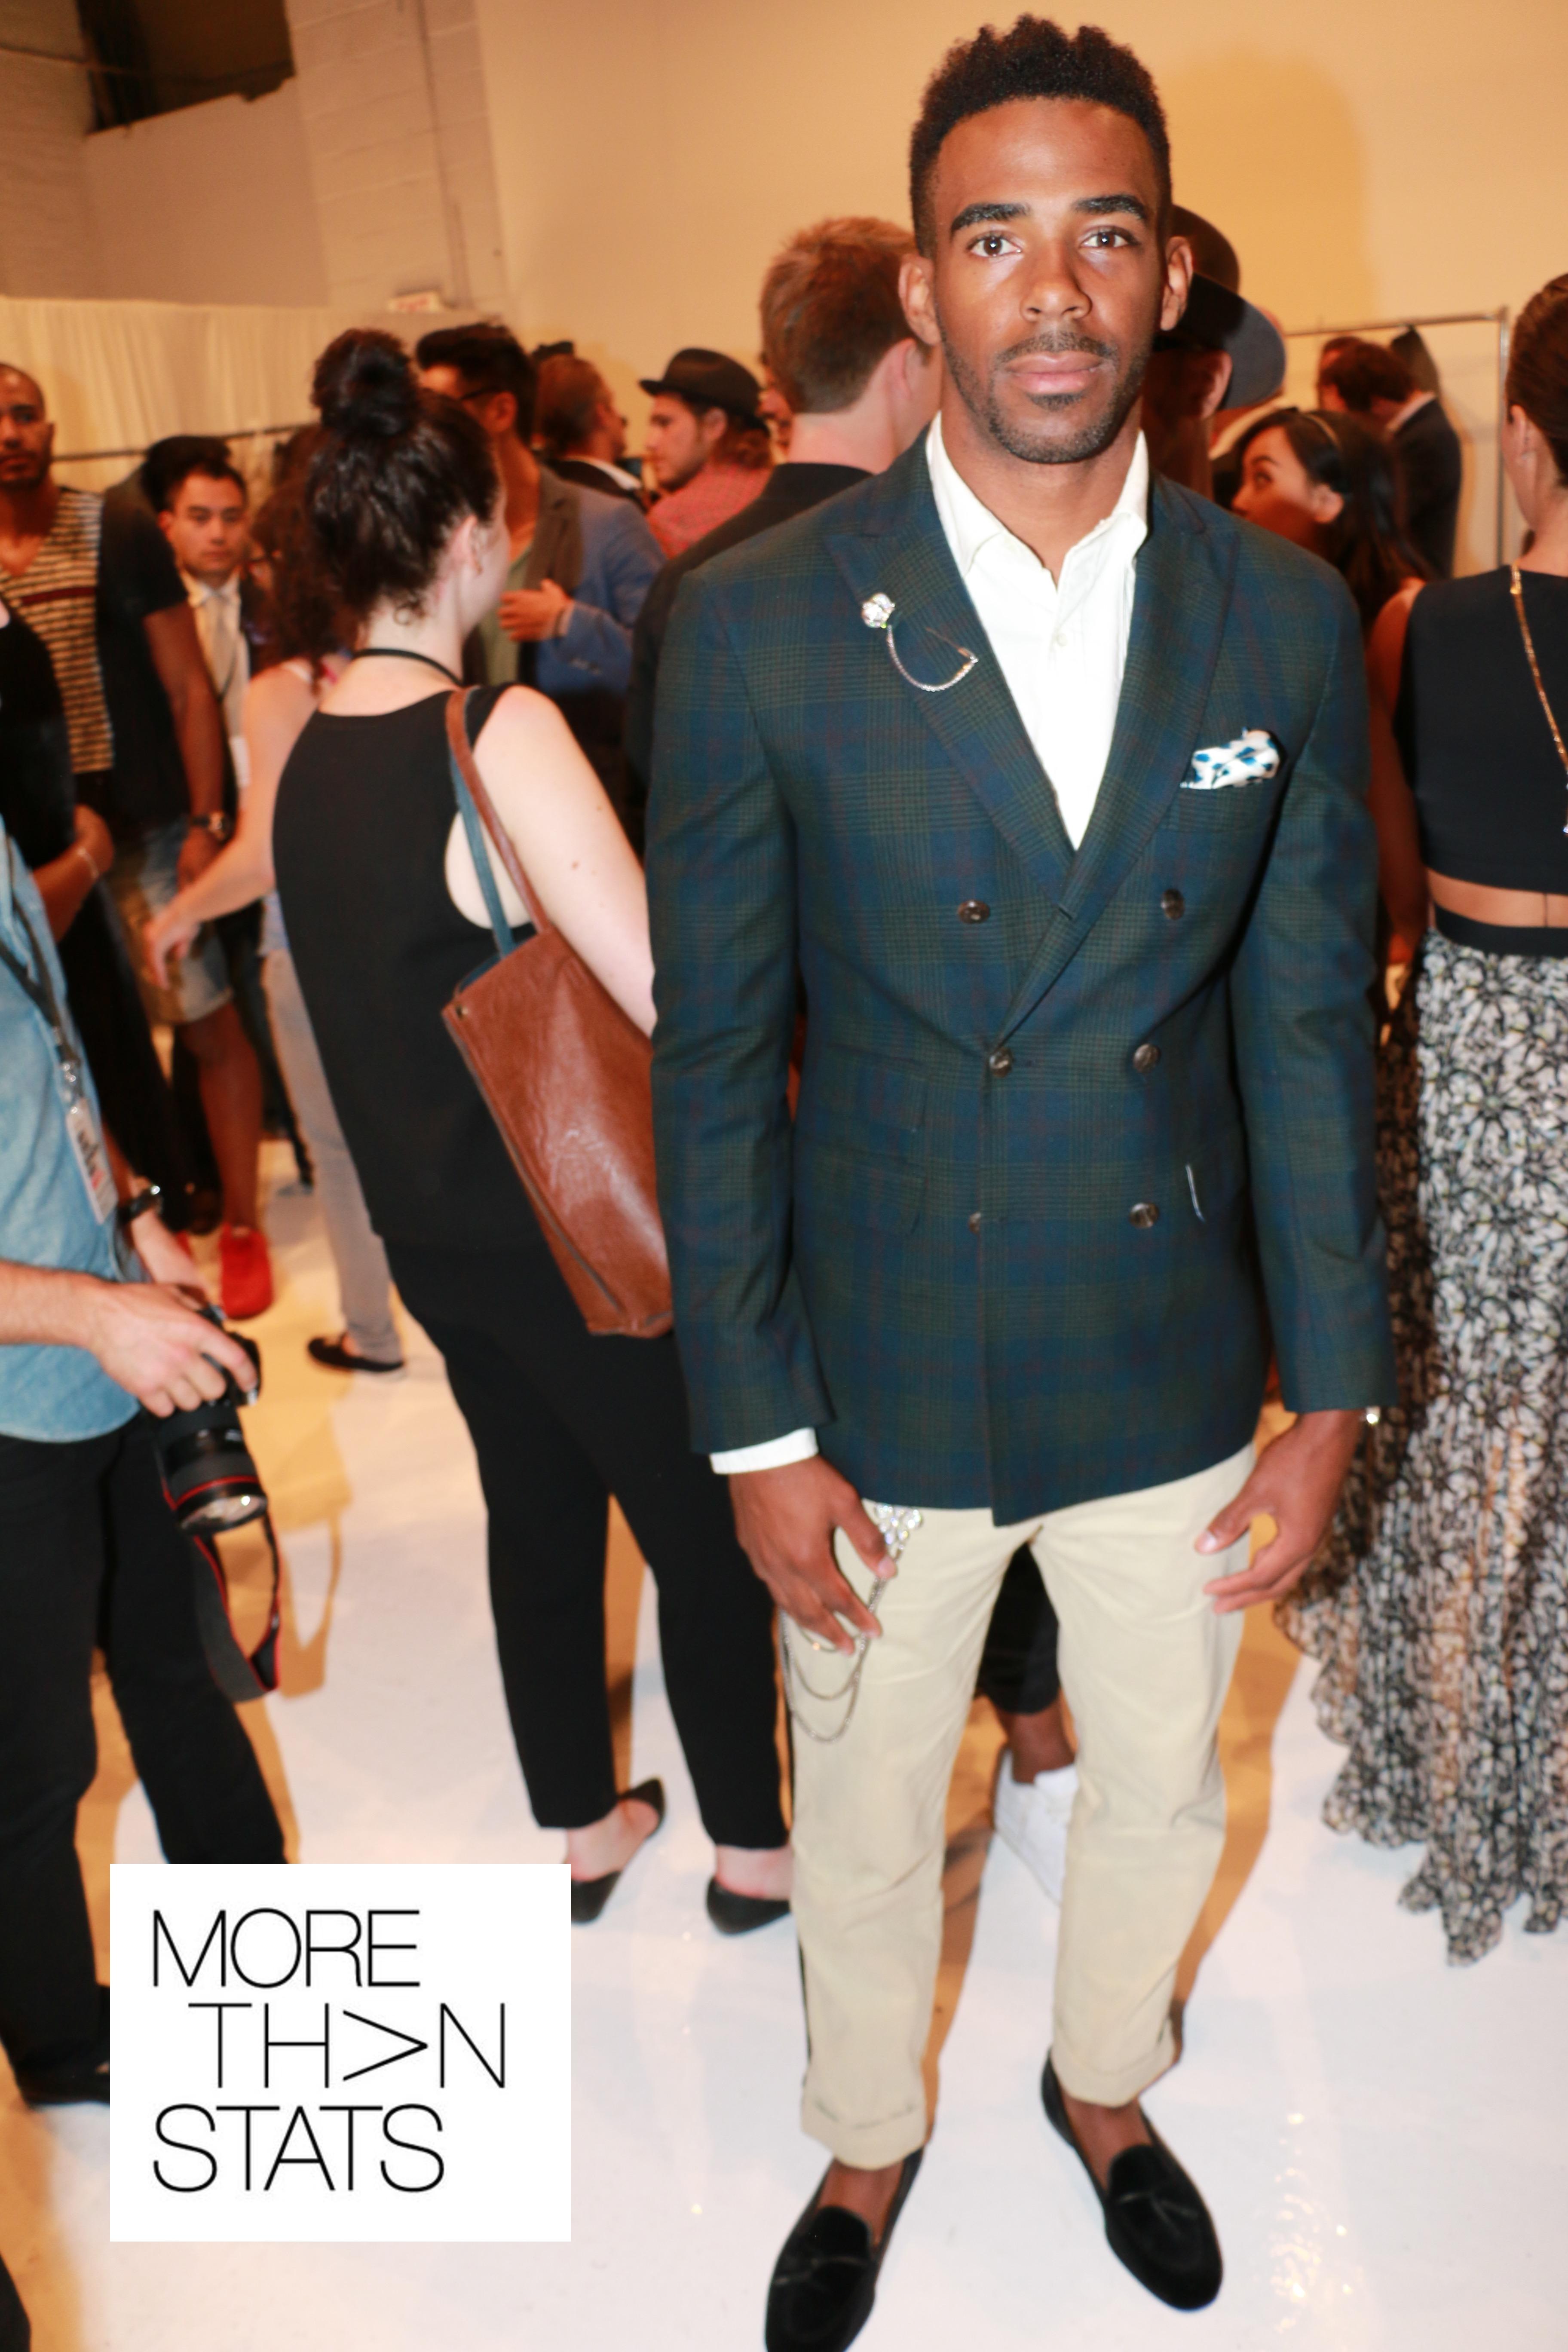 Mike-conley-jr-michael-bastian-new-york-mens-fashion-week-2